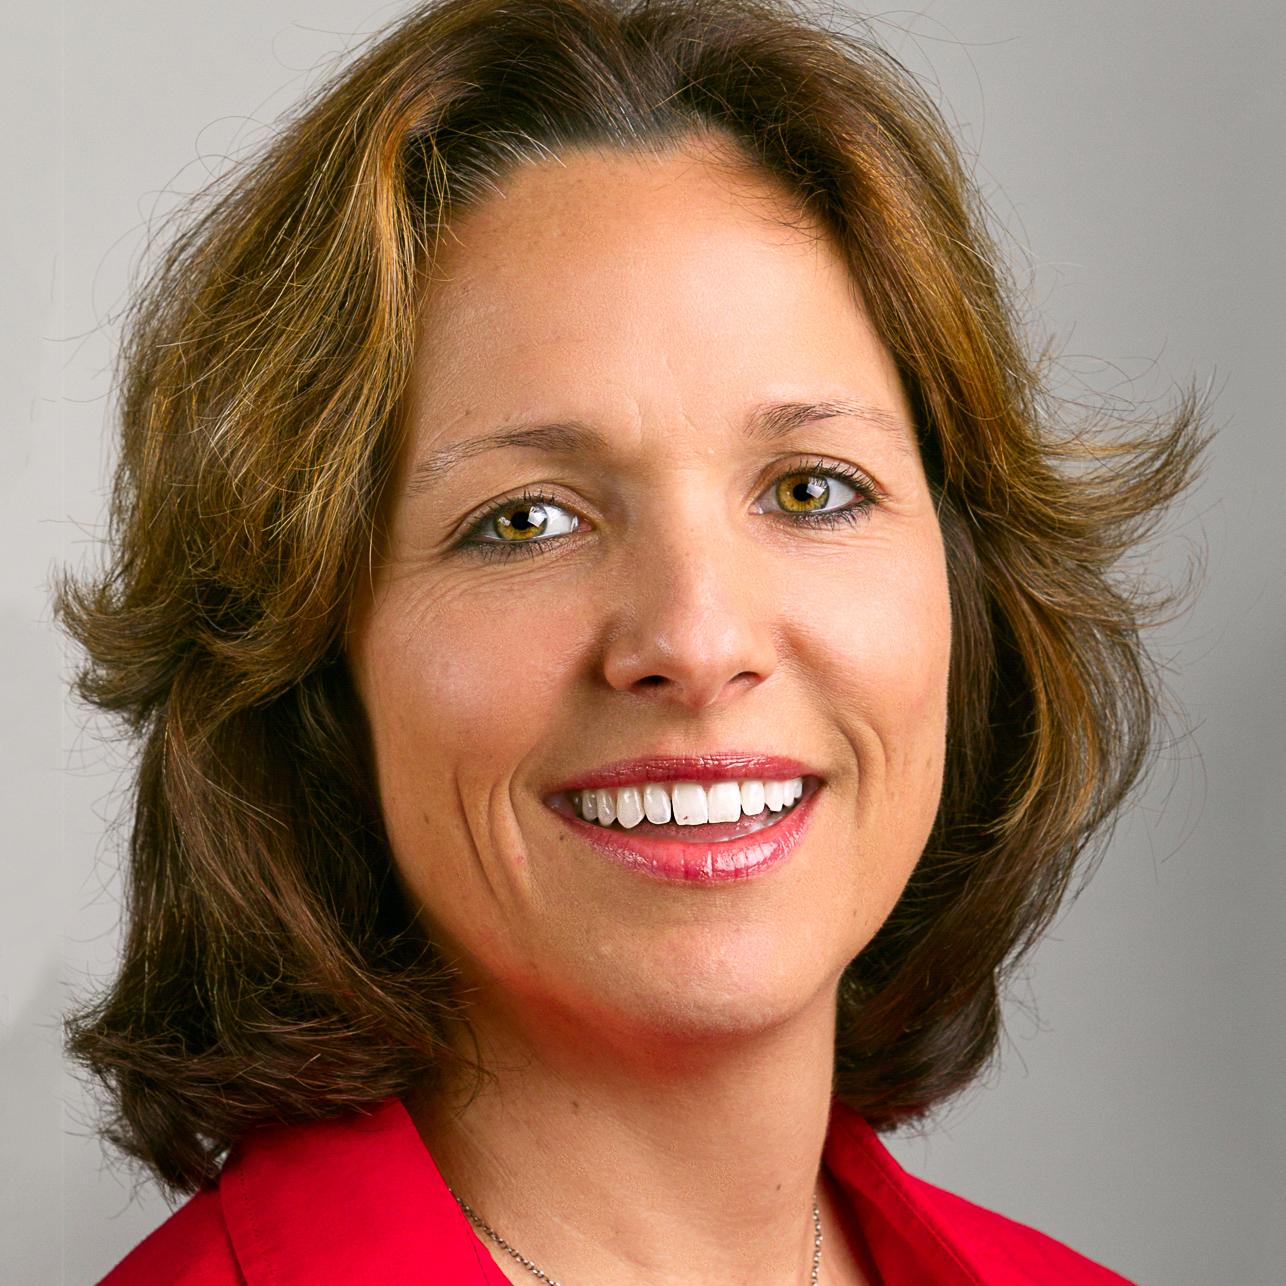 Leila Rouady, MBA, RA, CGC, LEED AP - Senior Architect / Construction Administration